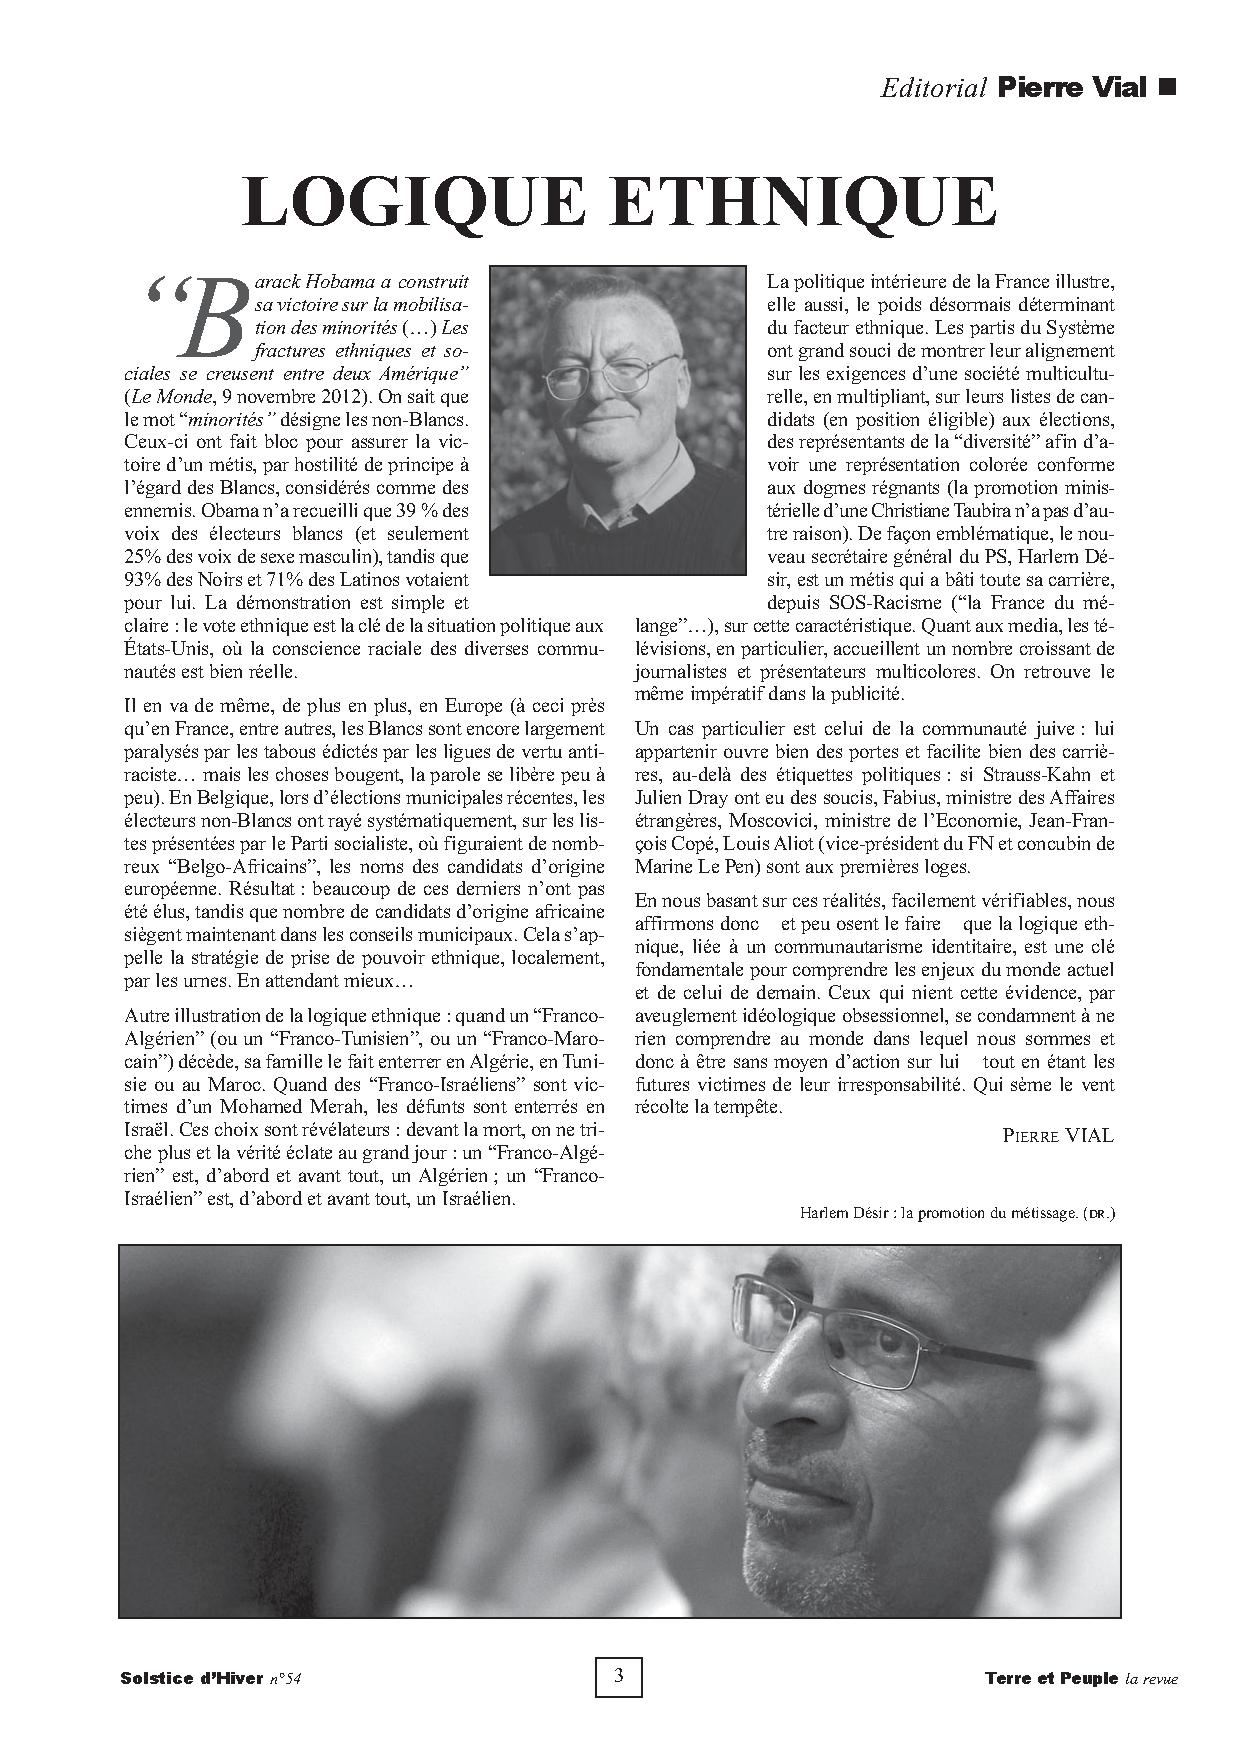 TP_54_-_editorial